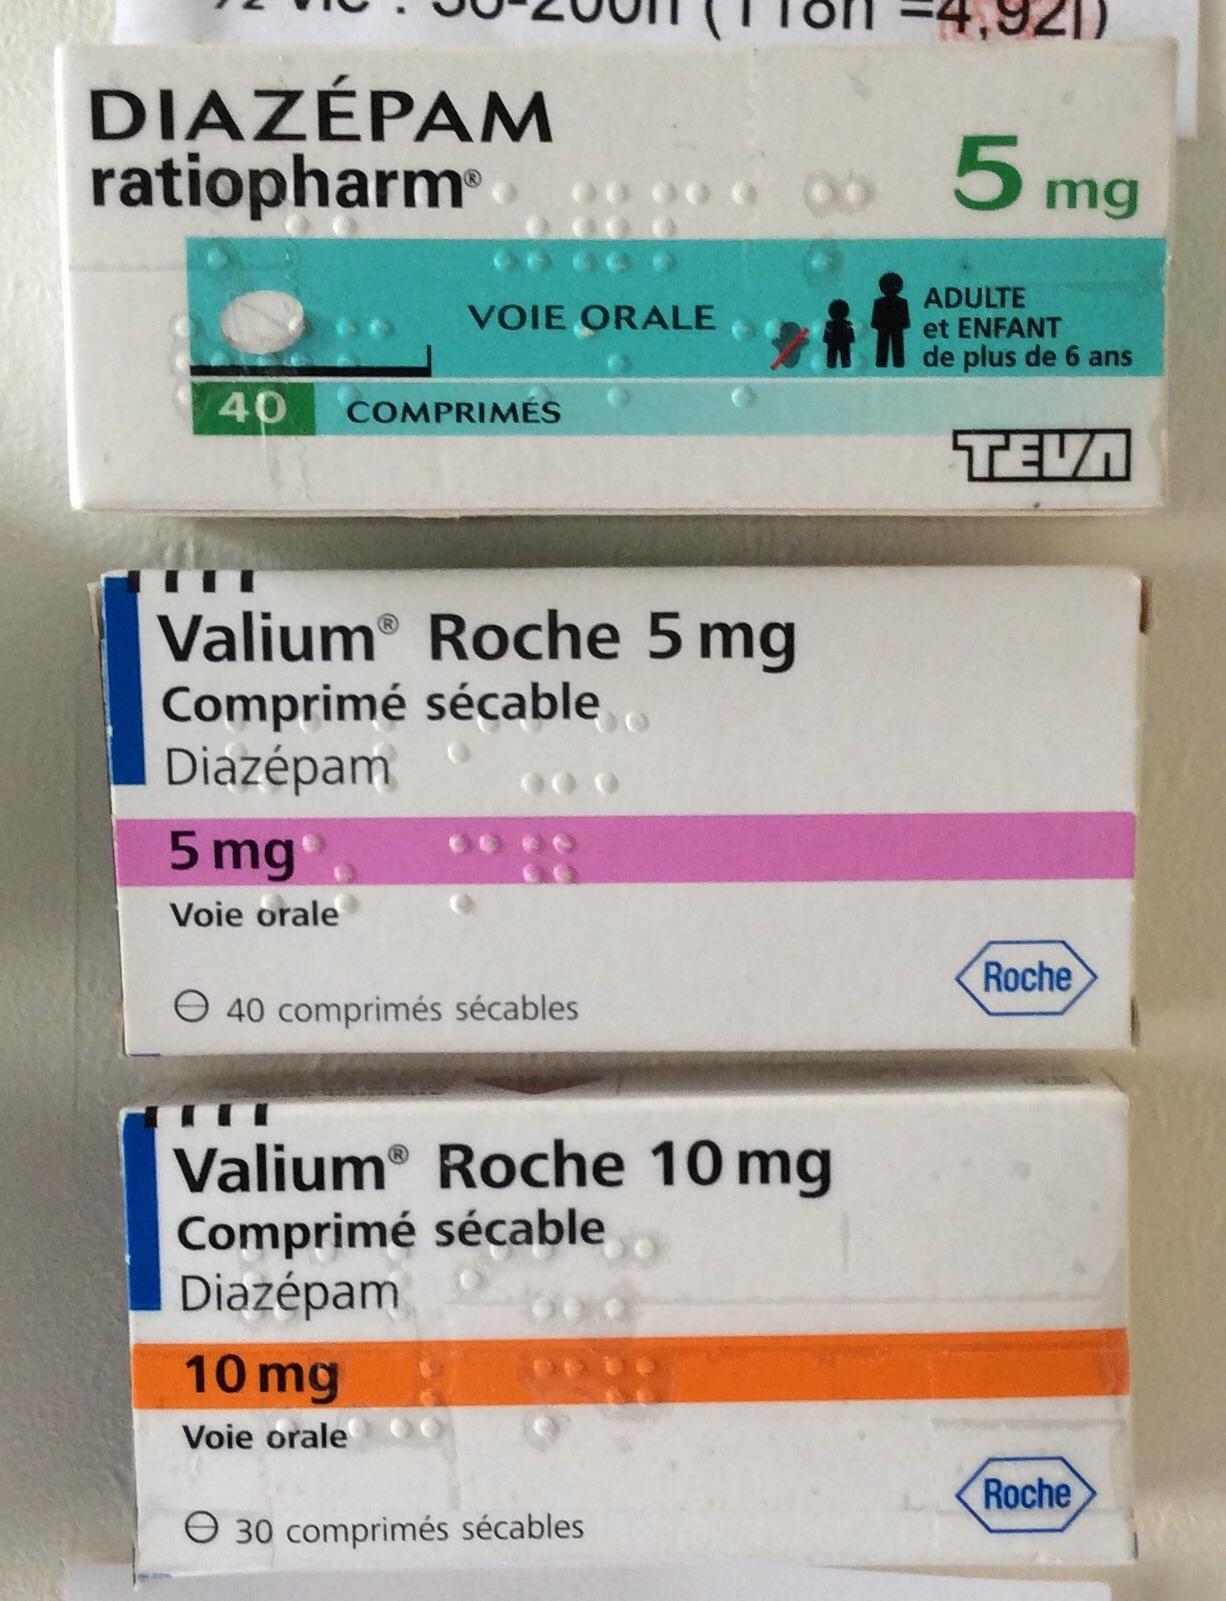 who should use valium overdose quantity